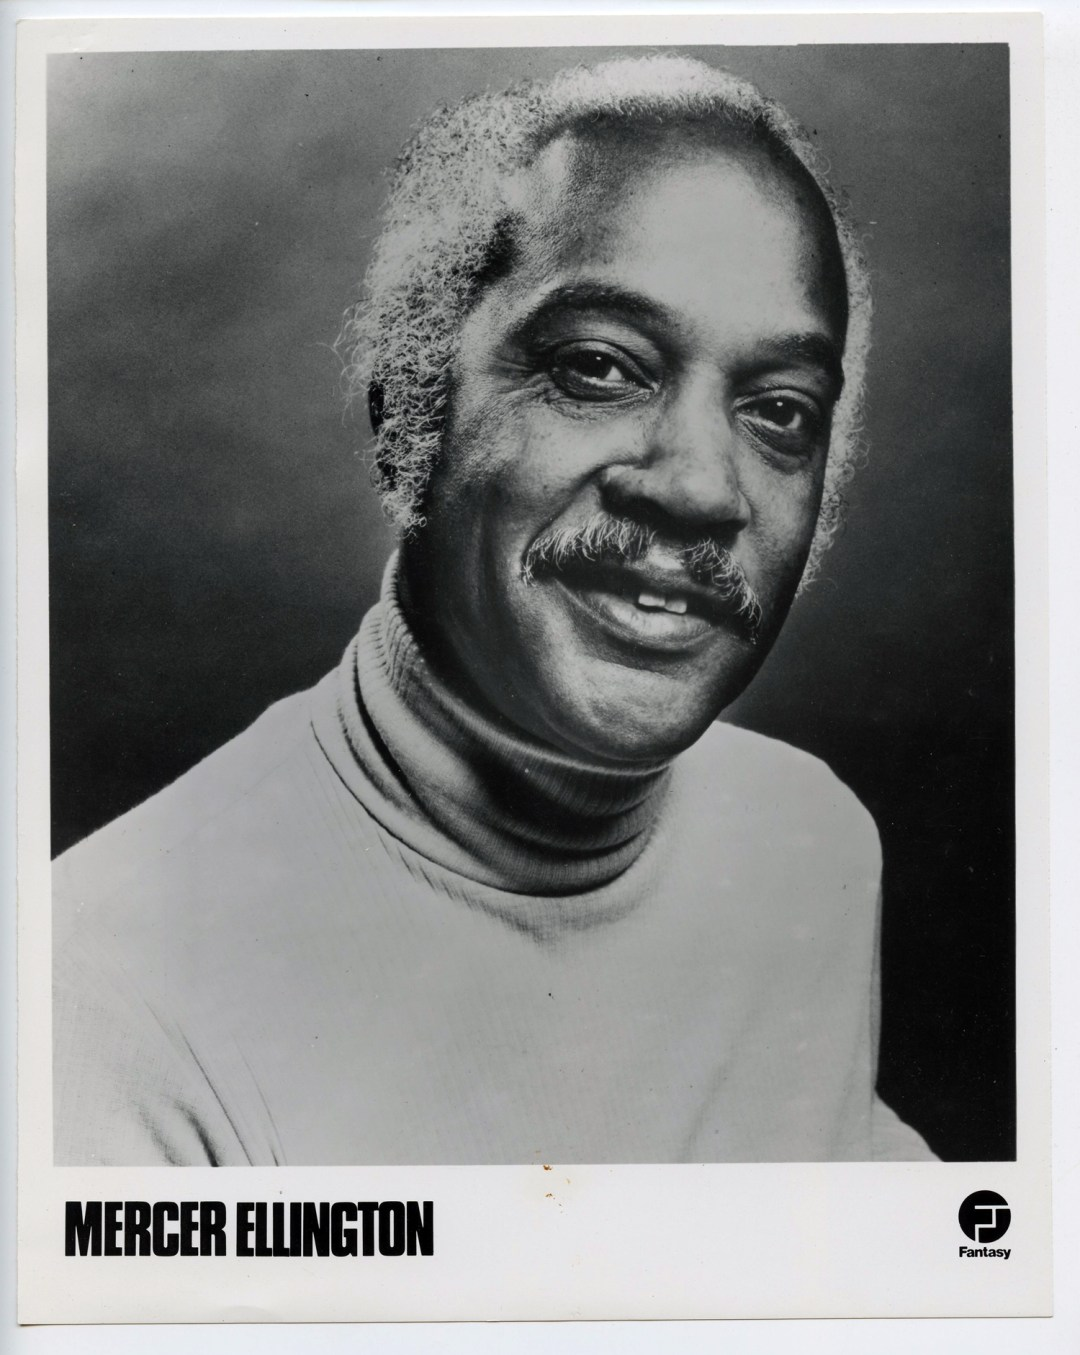 Mercer Ellington Photo Fantasy Records Original Vintage